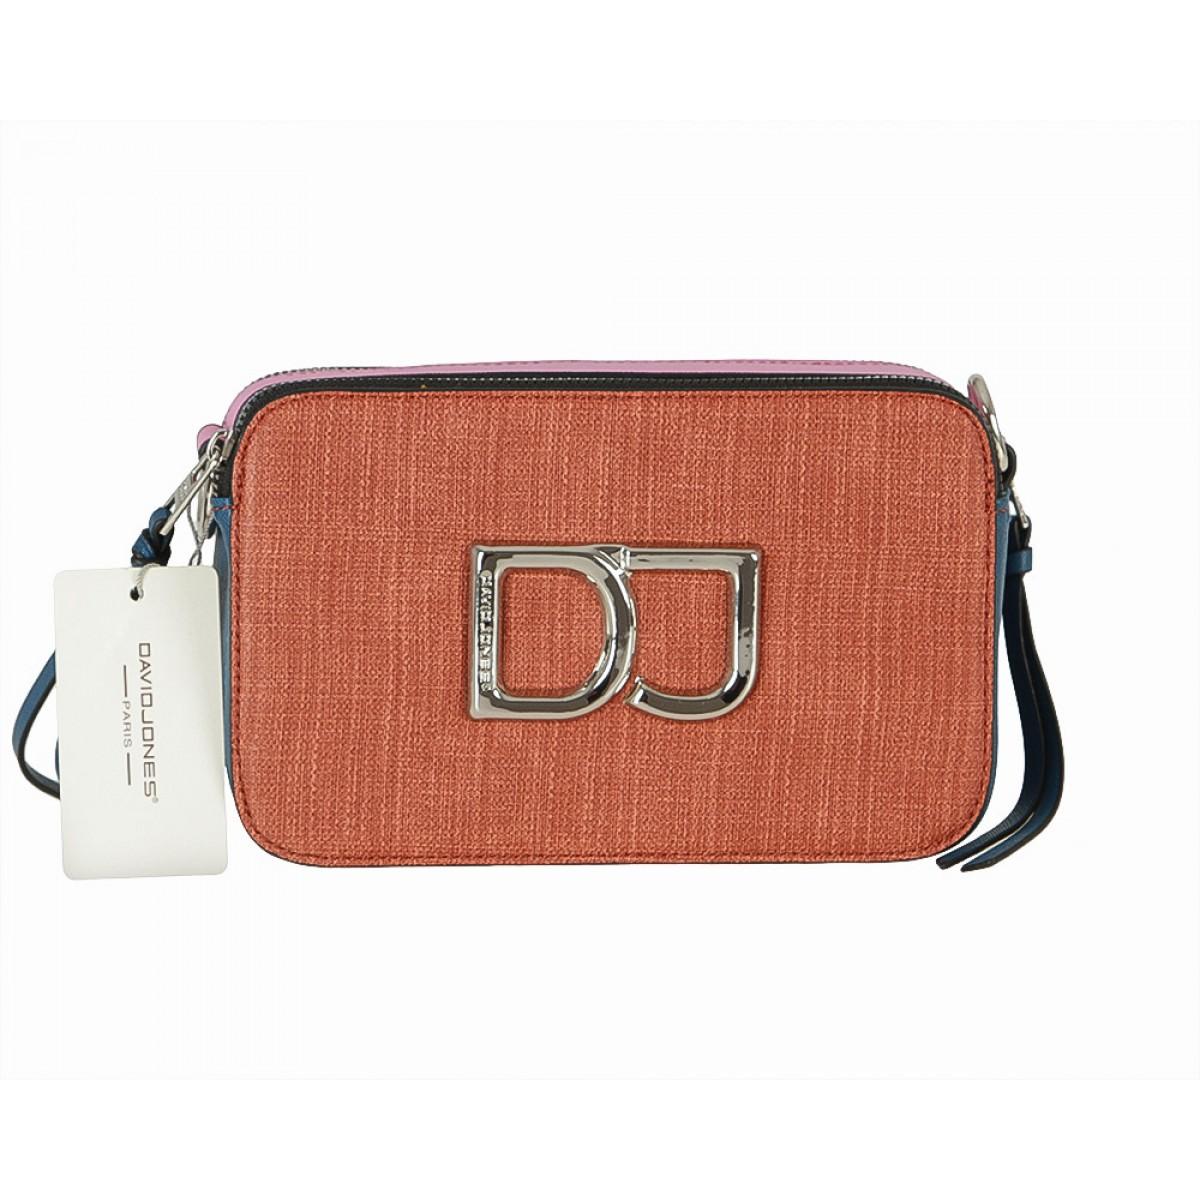 Жіноча сумка David Jones CM5701 BRICK RED